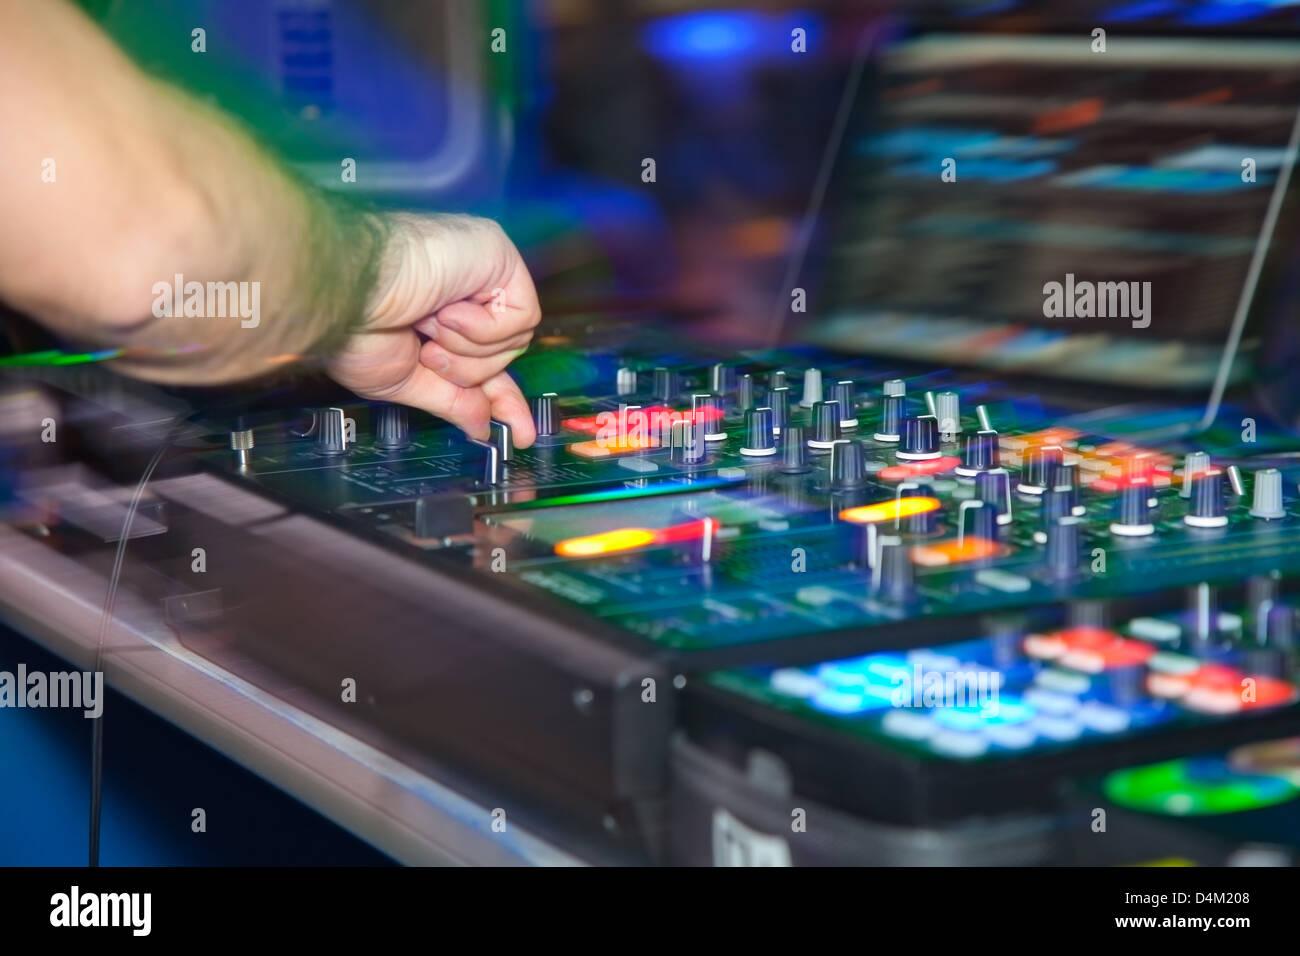 DJ behind the decks in night club - Stock Image